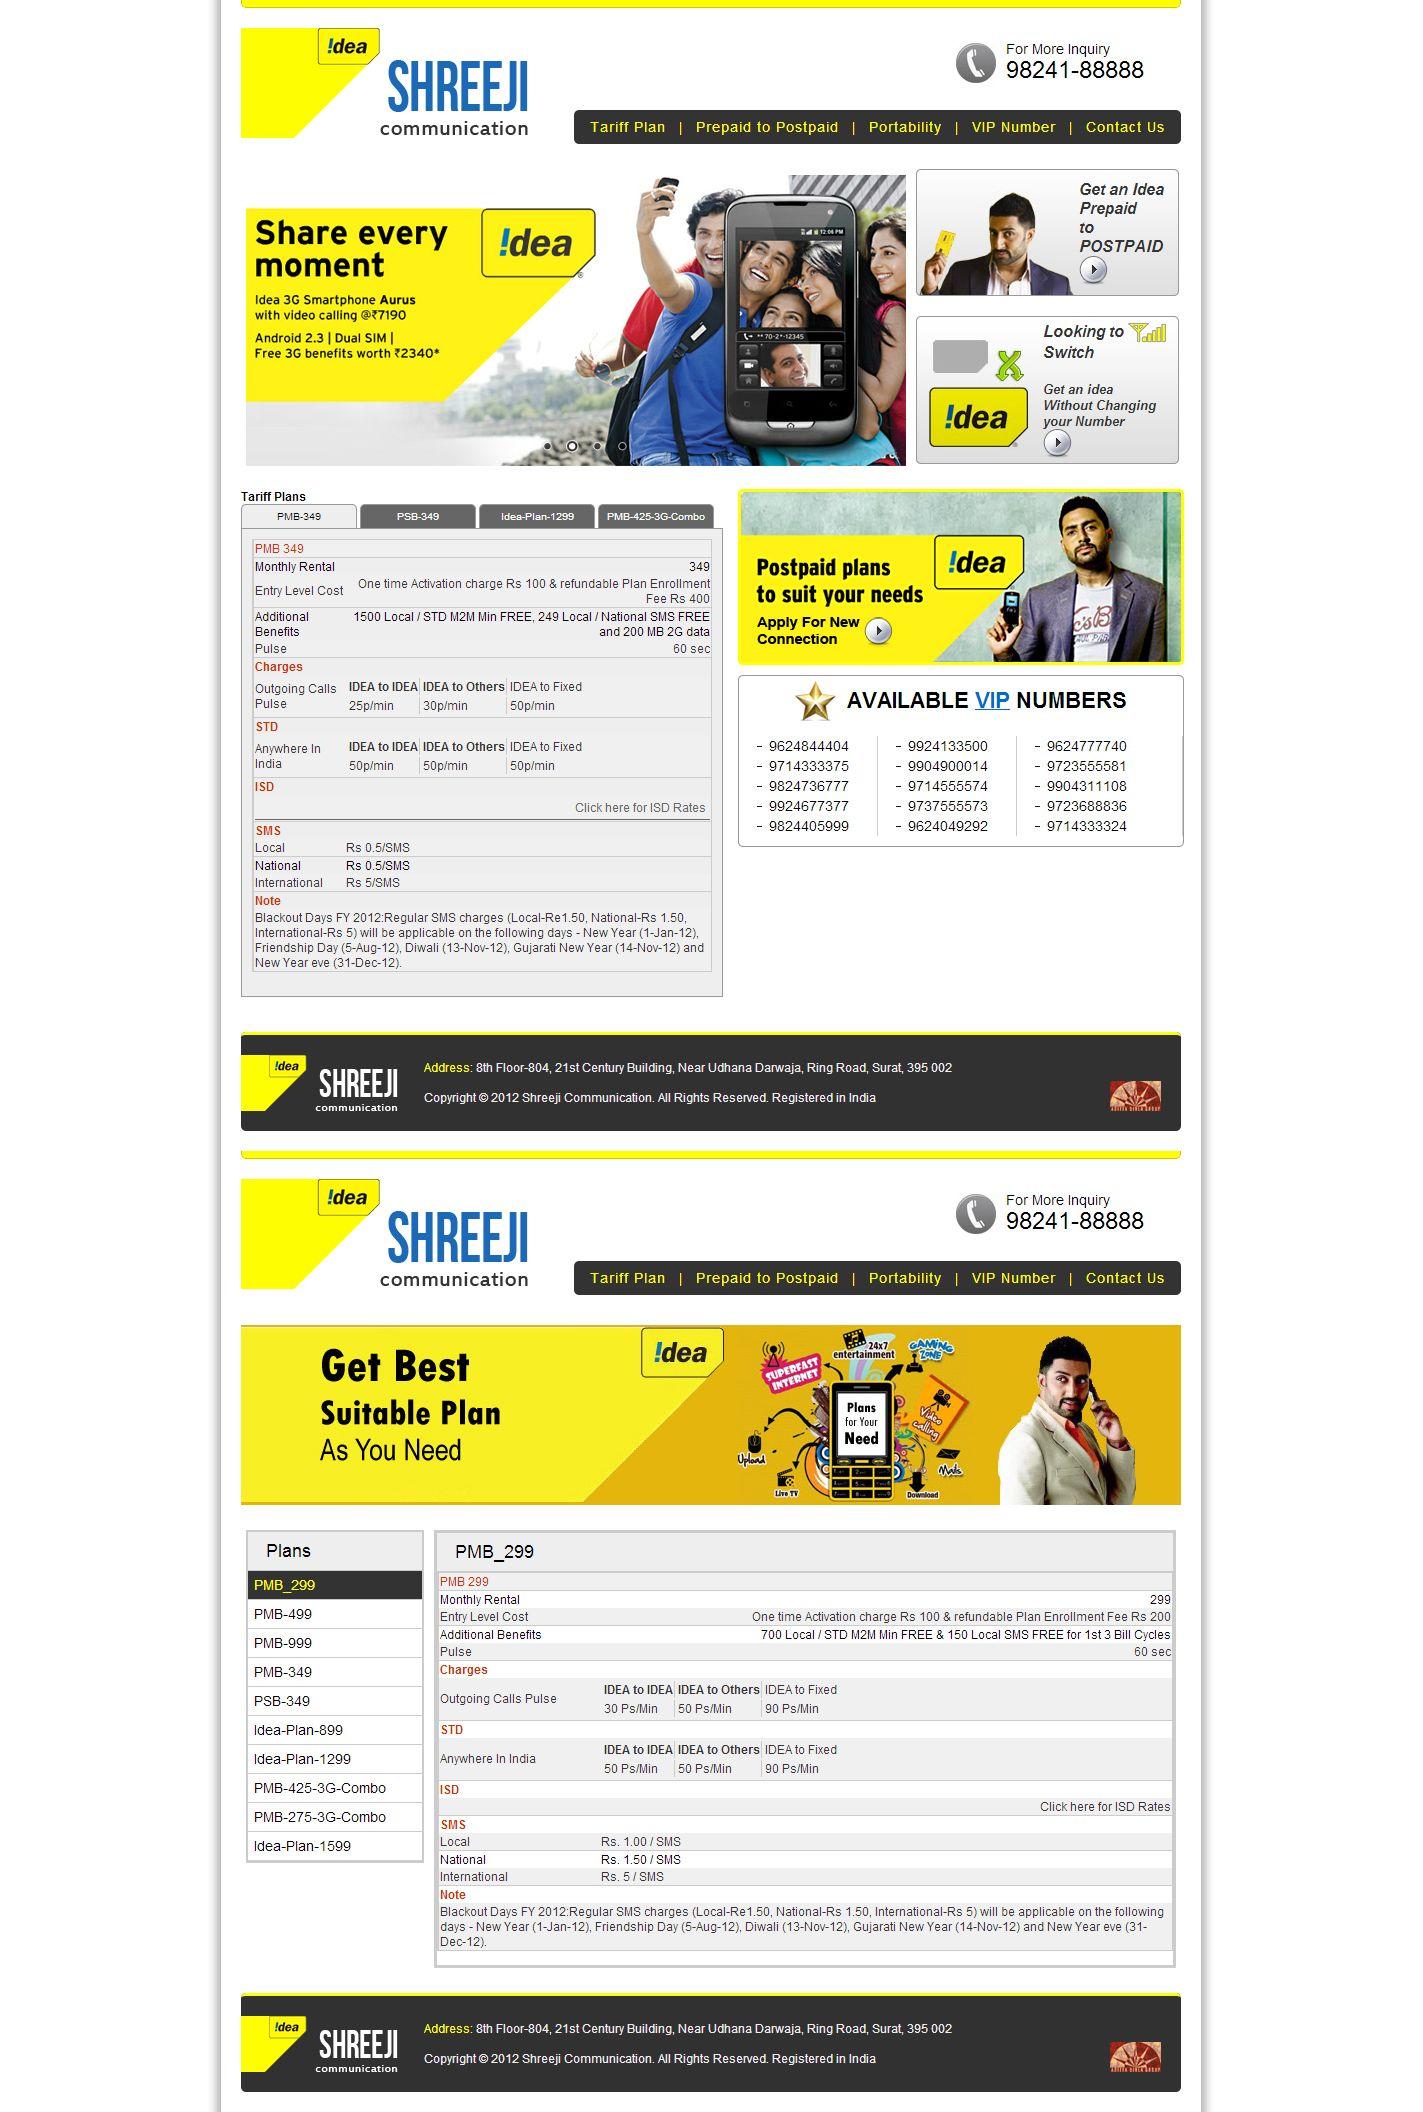 Shreeji Communication Idea Call Center And Sales Center